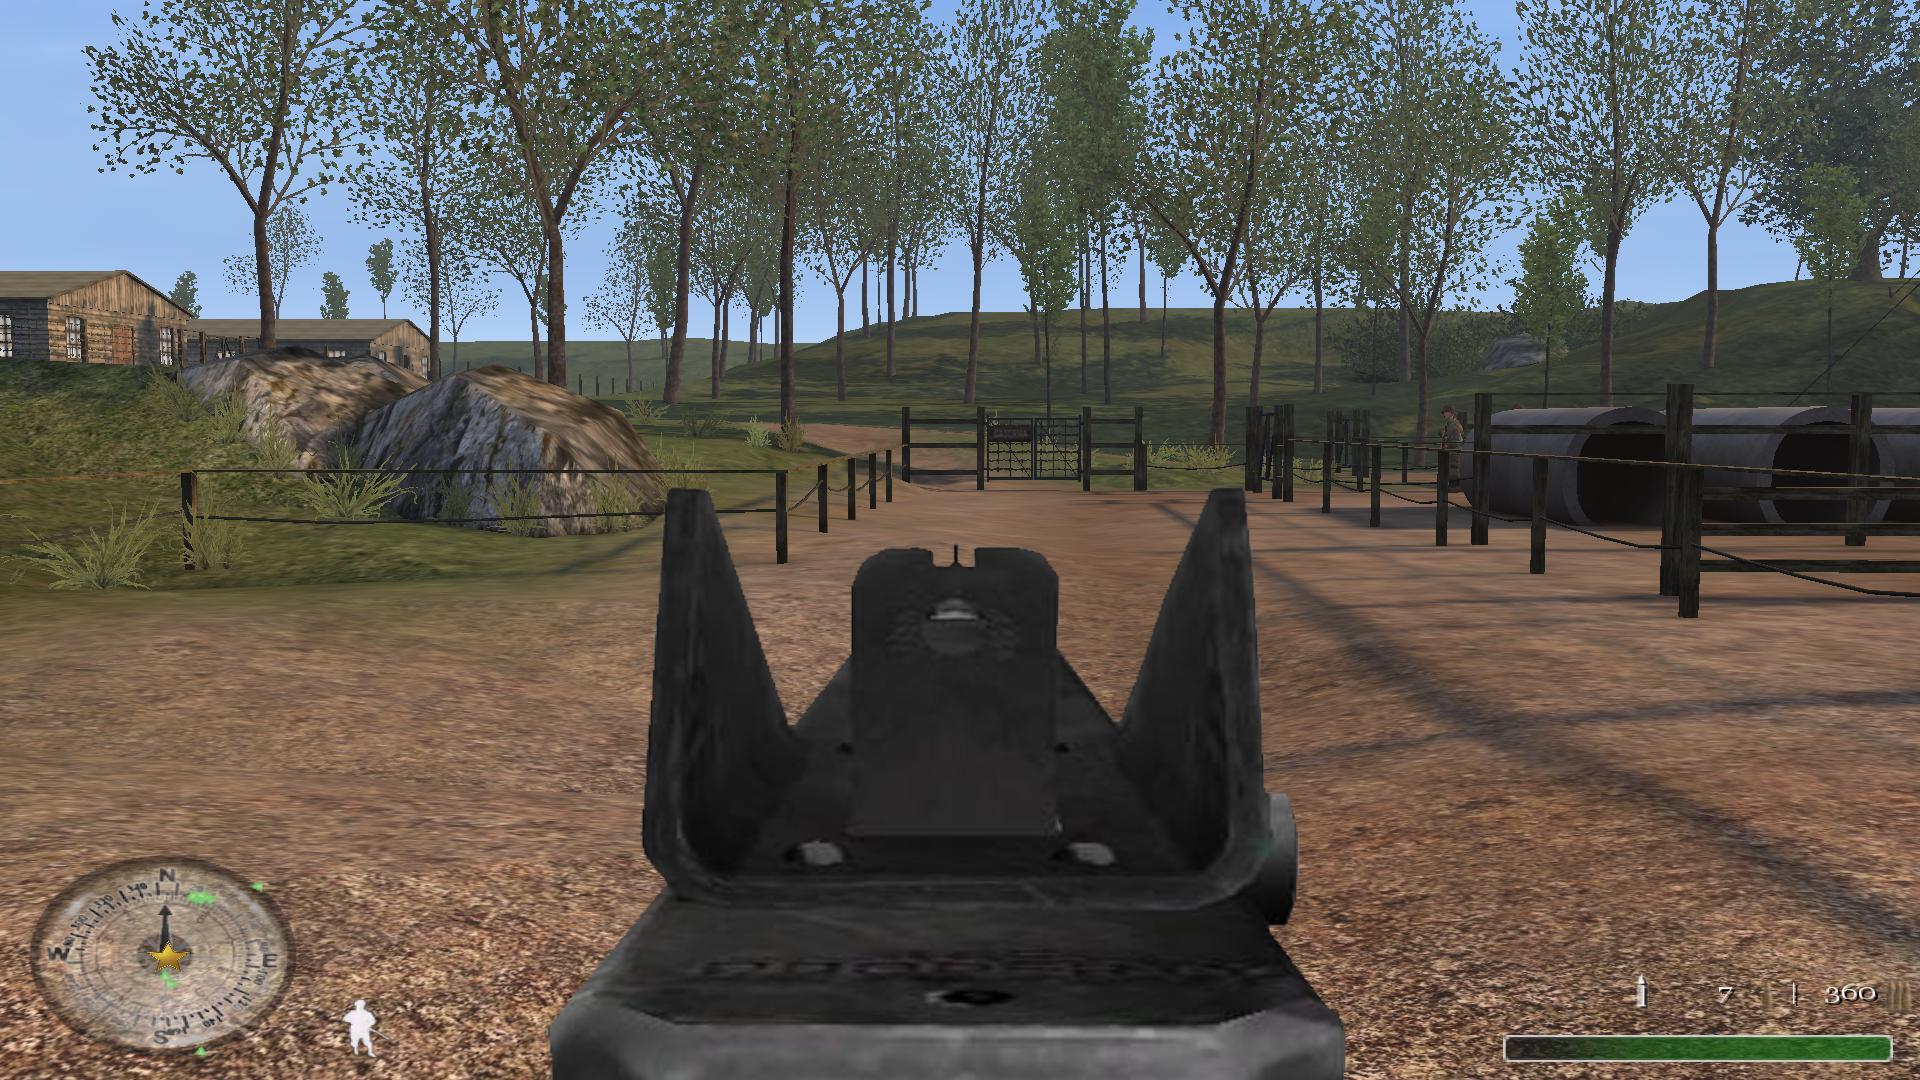 Semi-auto Thompson sight image - Call of Duty: United Fronts